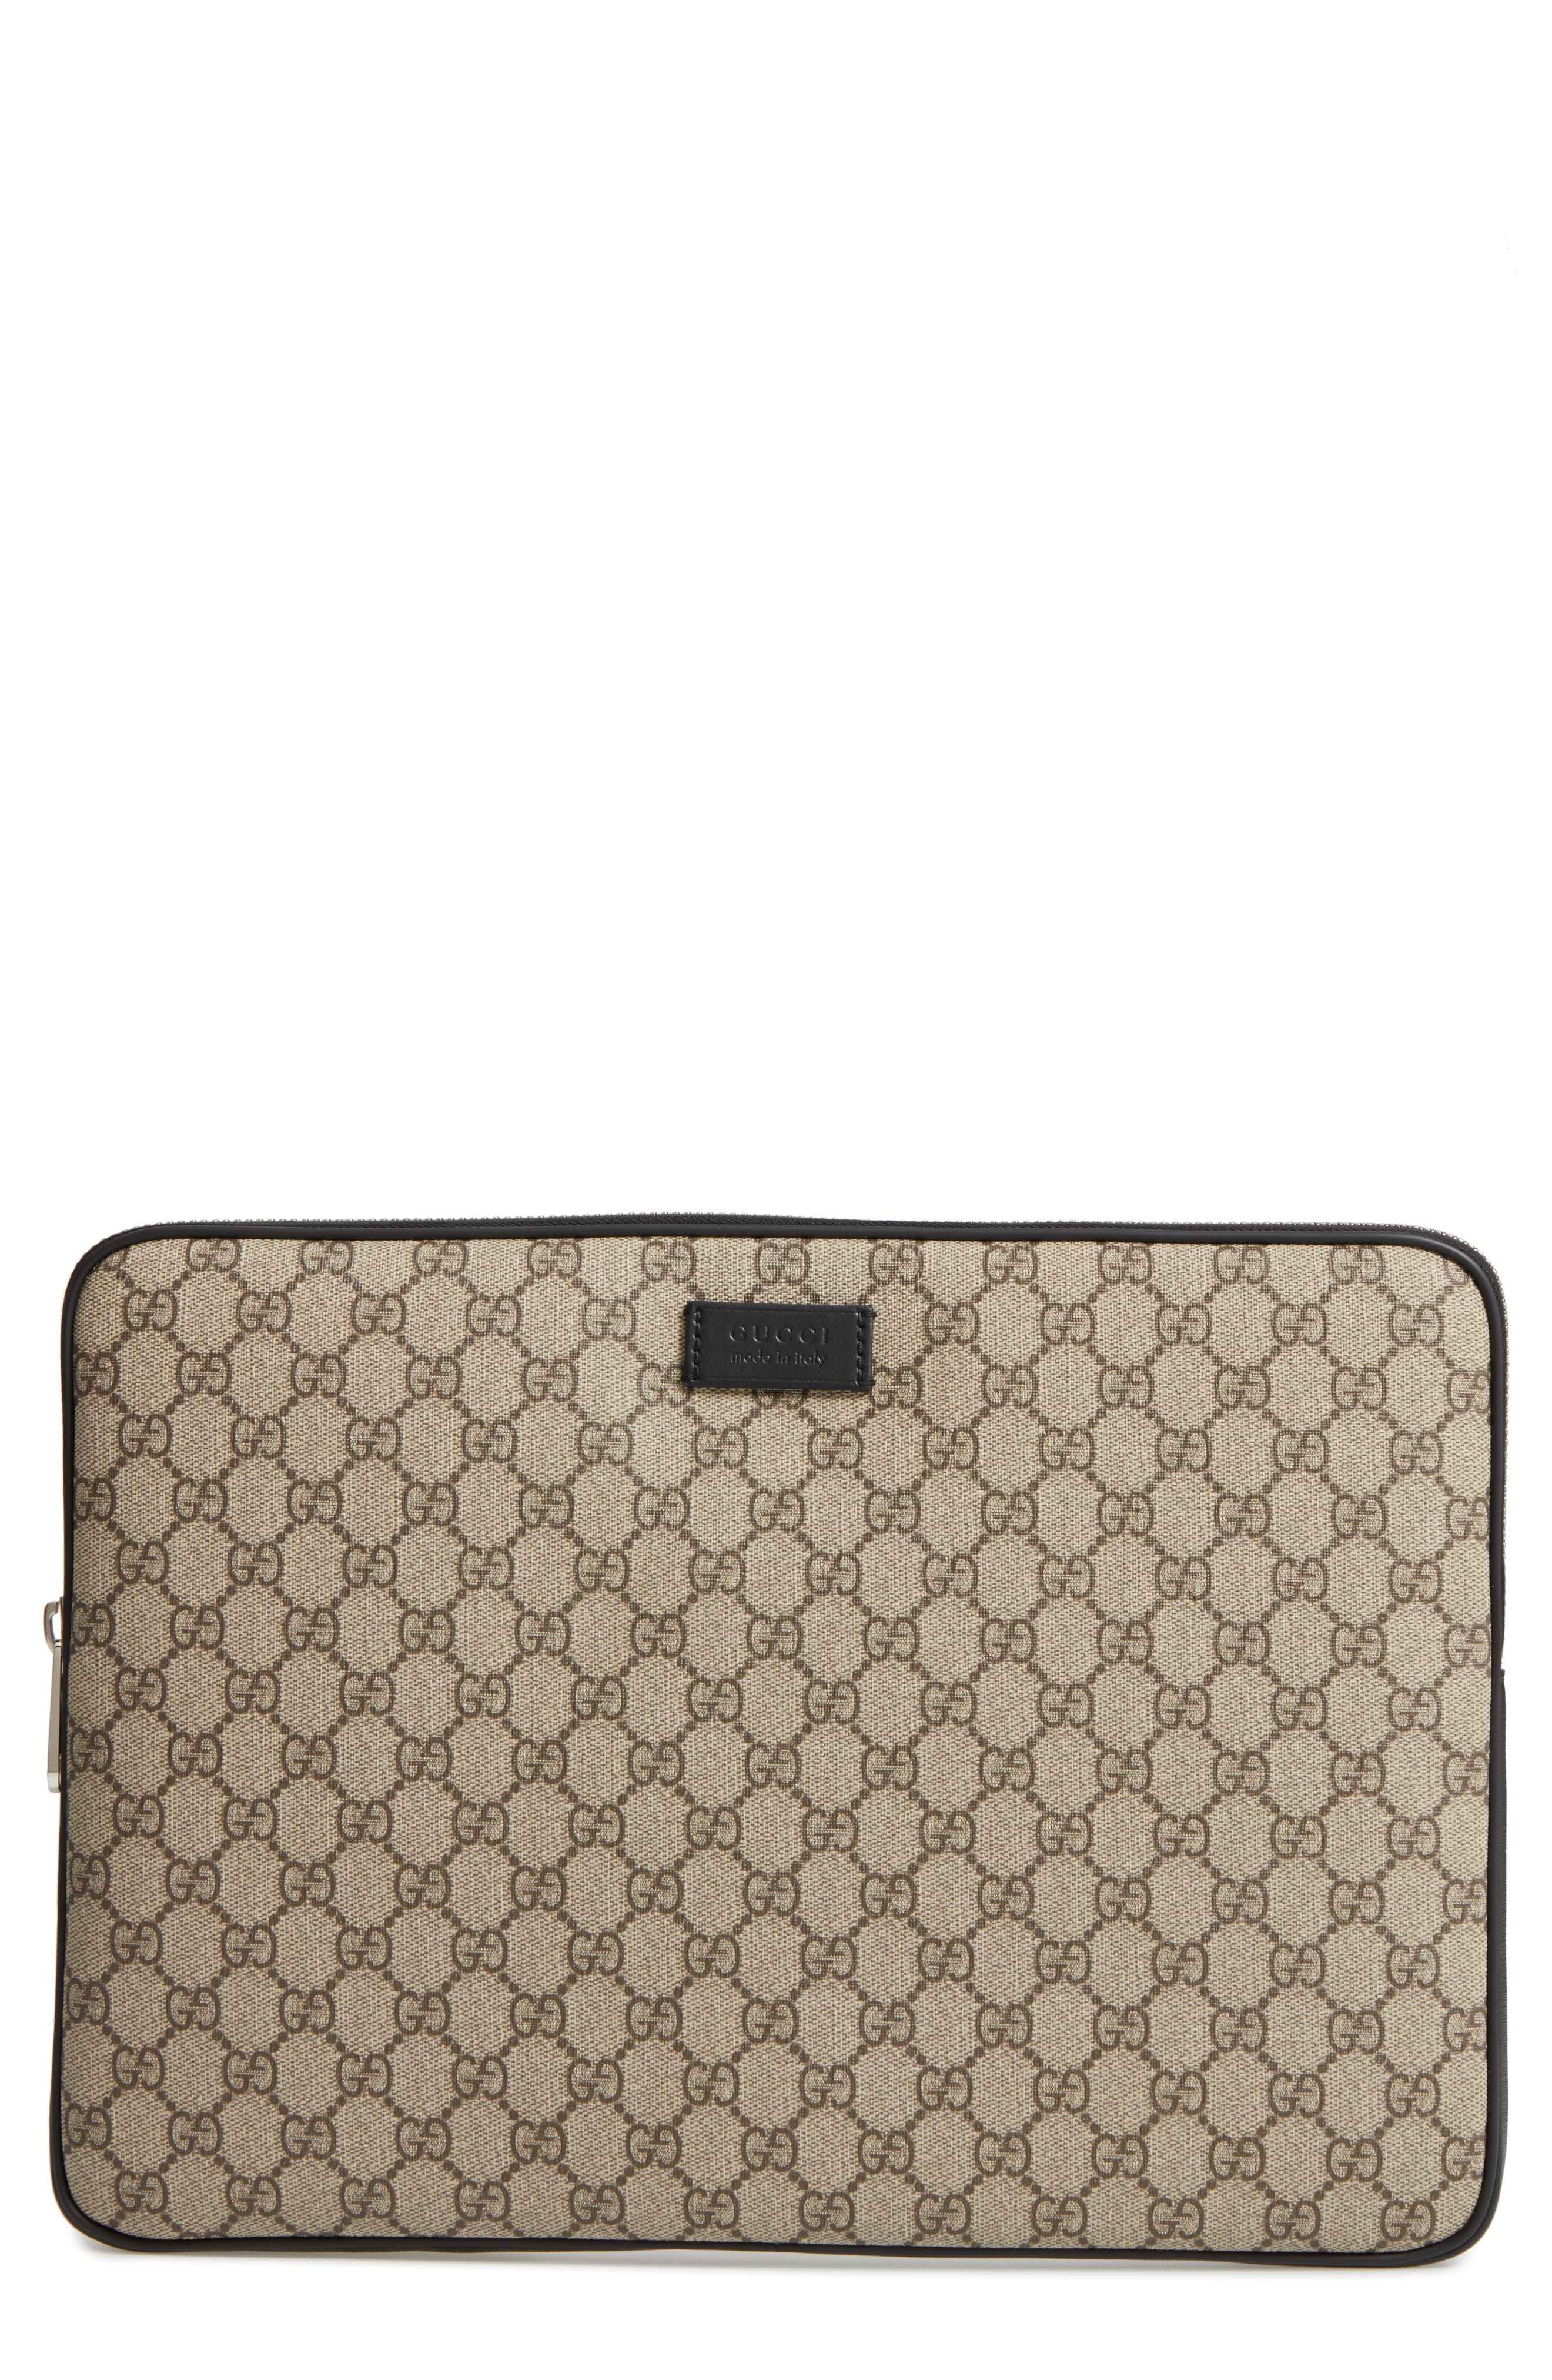 Gucci Eden Canvas Laptop Sleeve